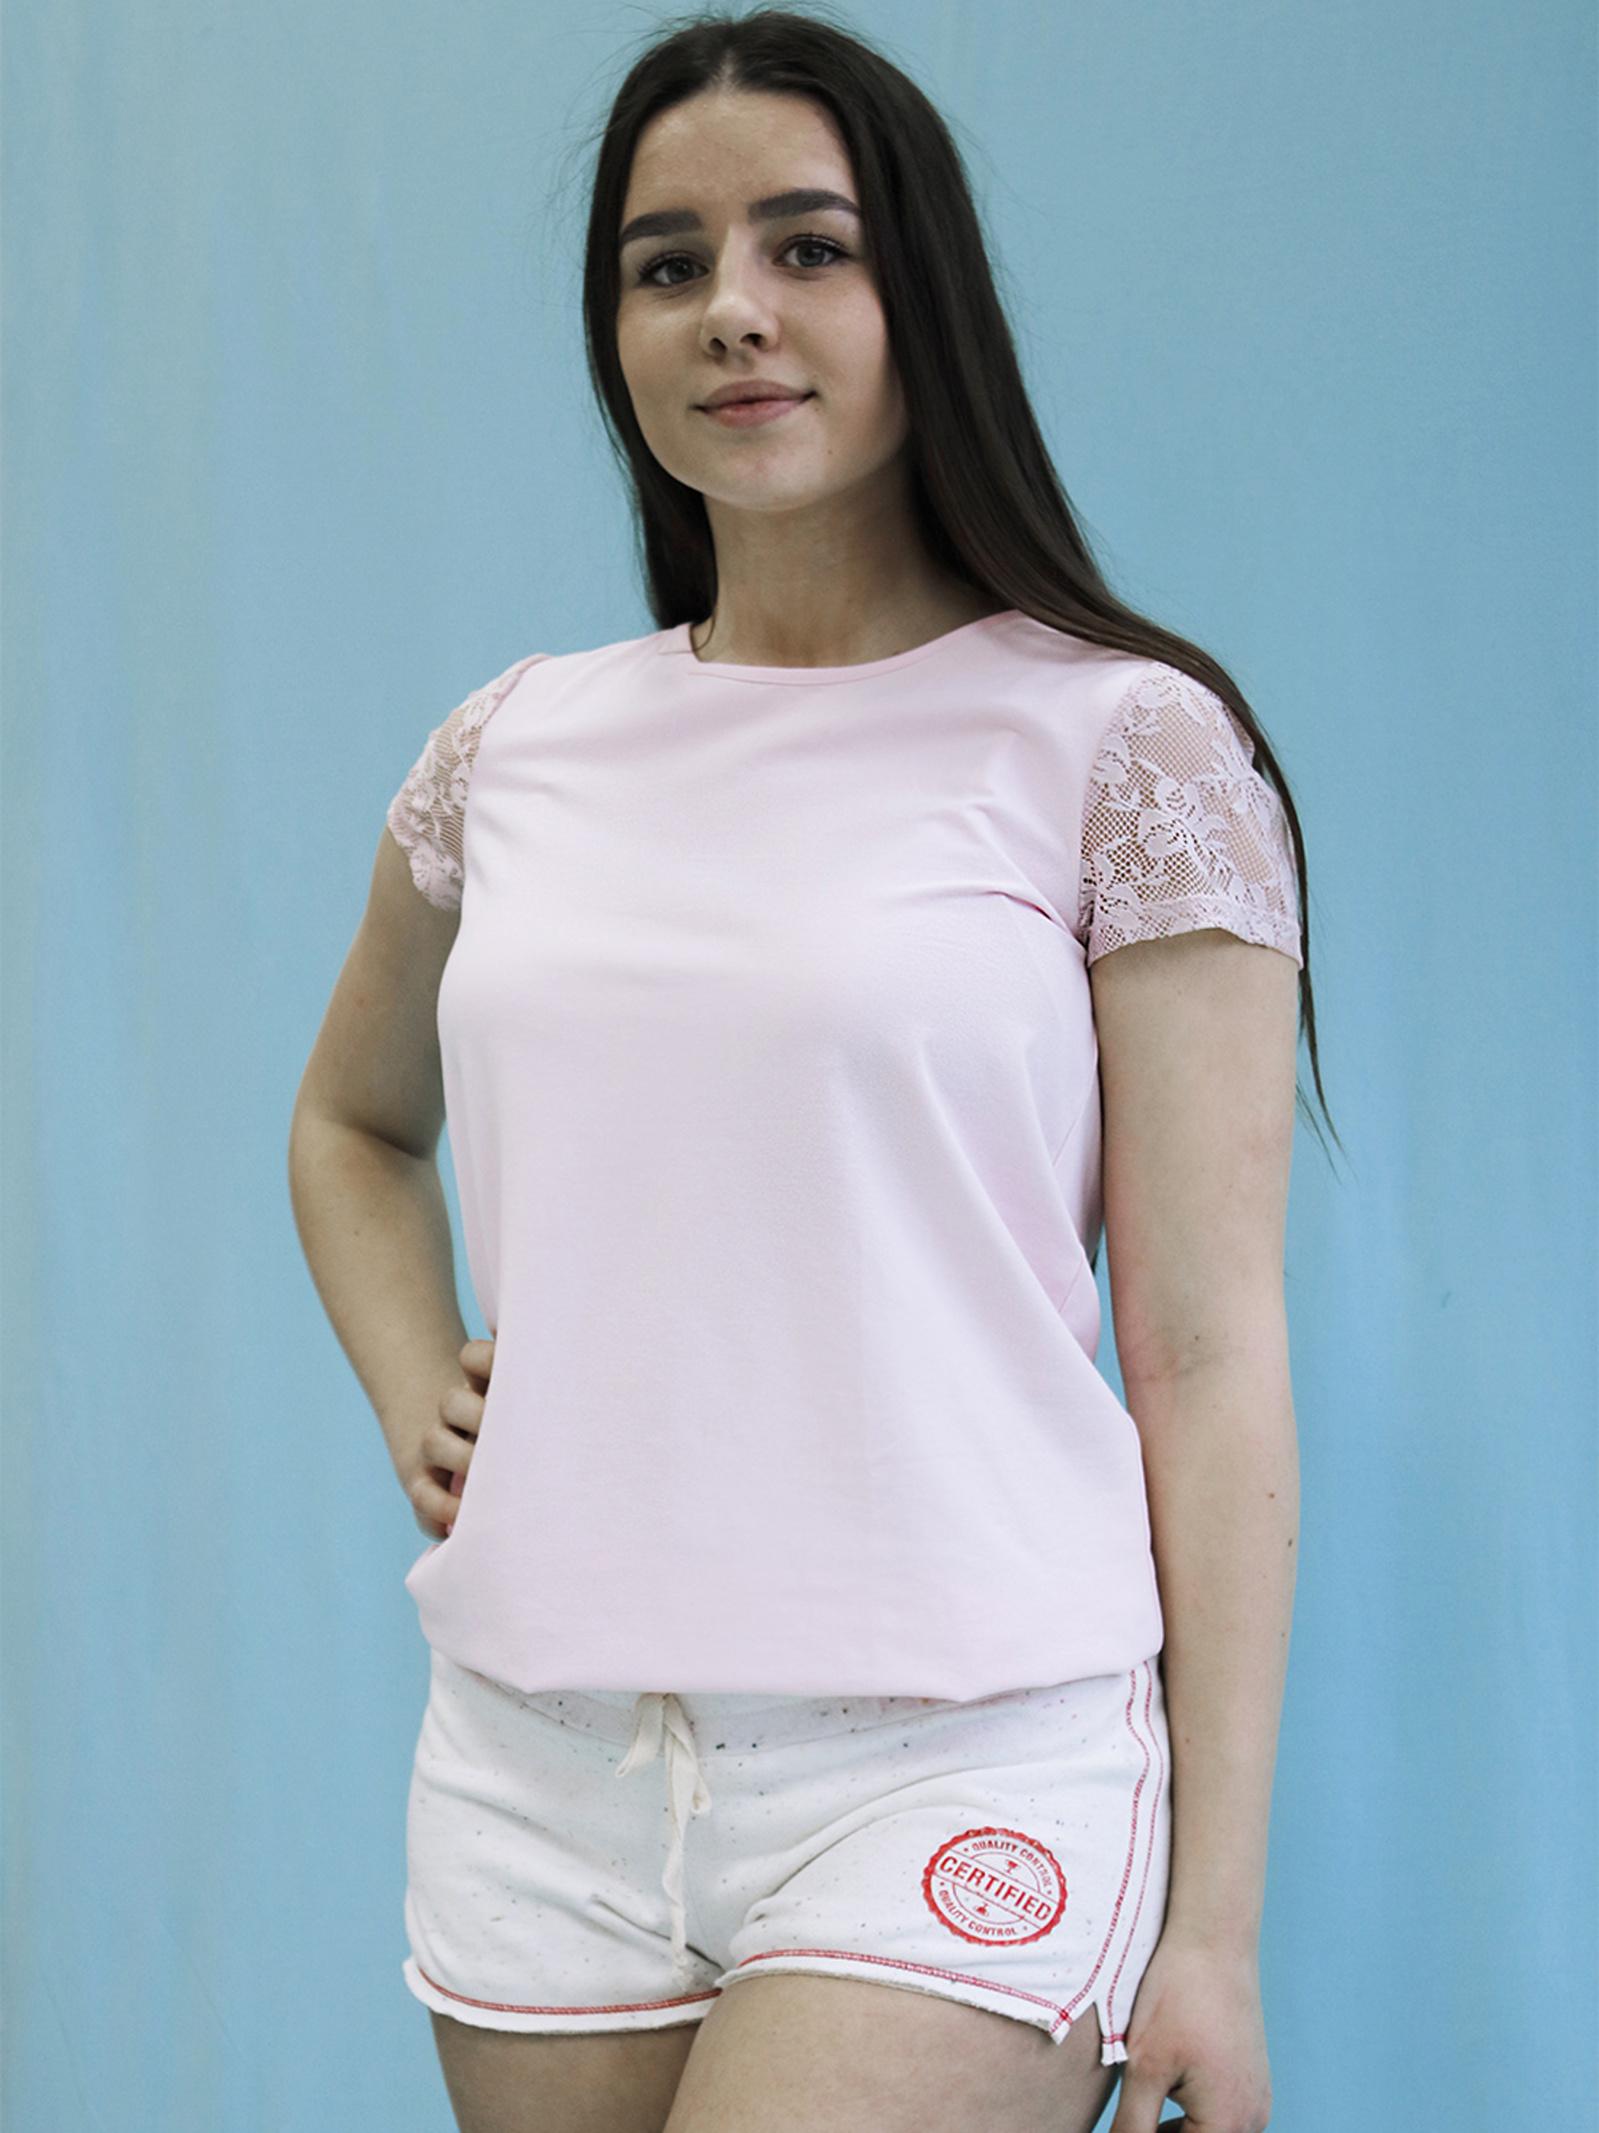 Effetto Футболка жіночі модель 0144 Жіноча футболка якість, 2017